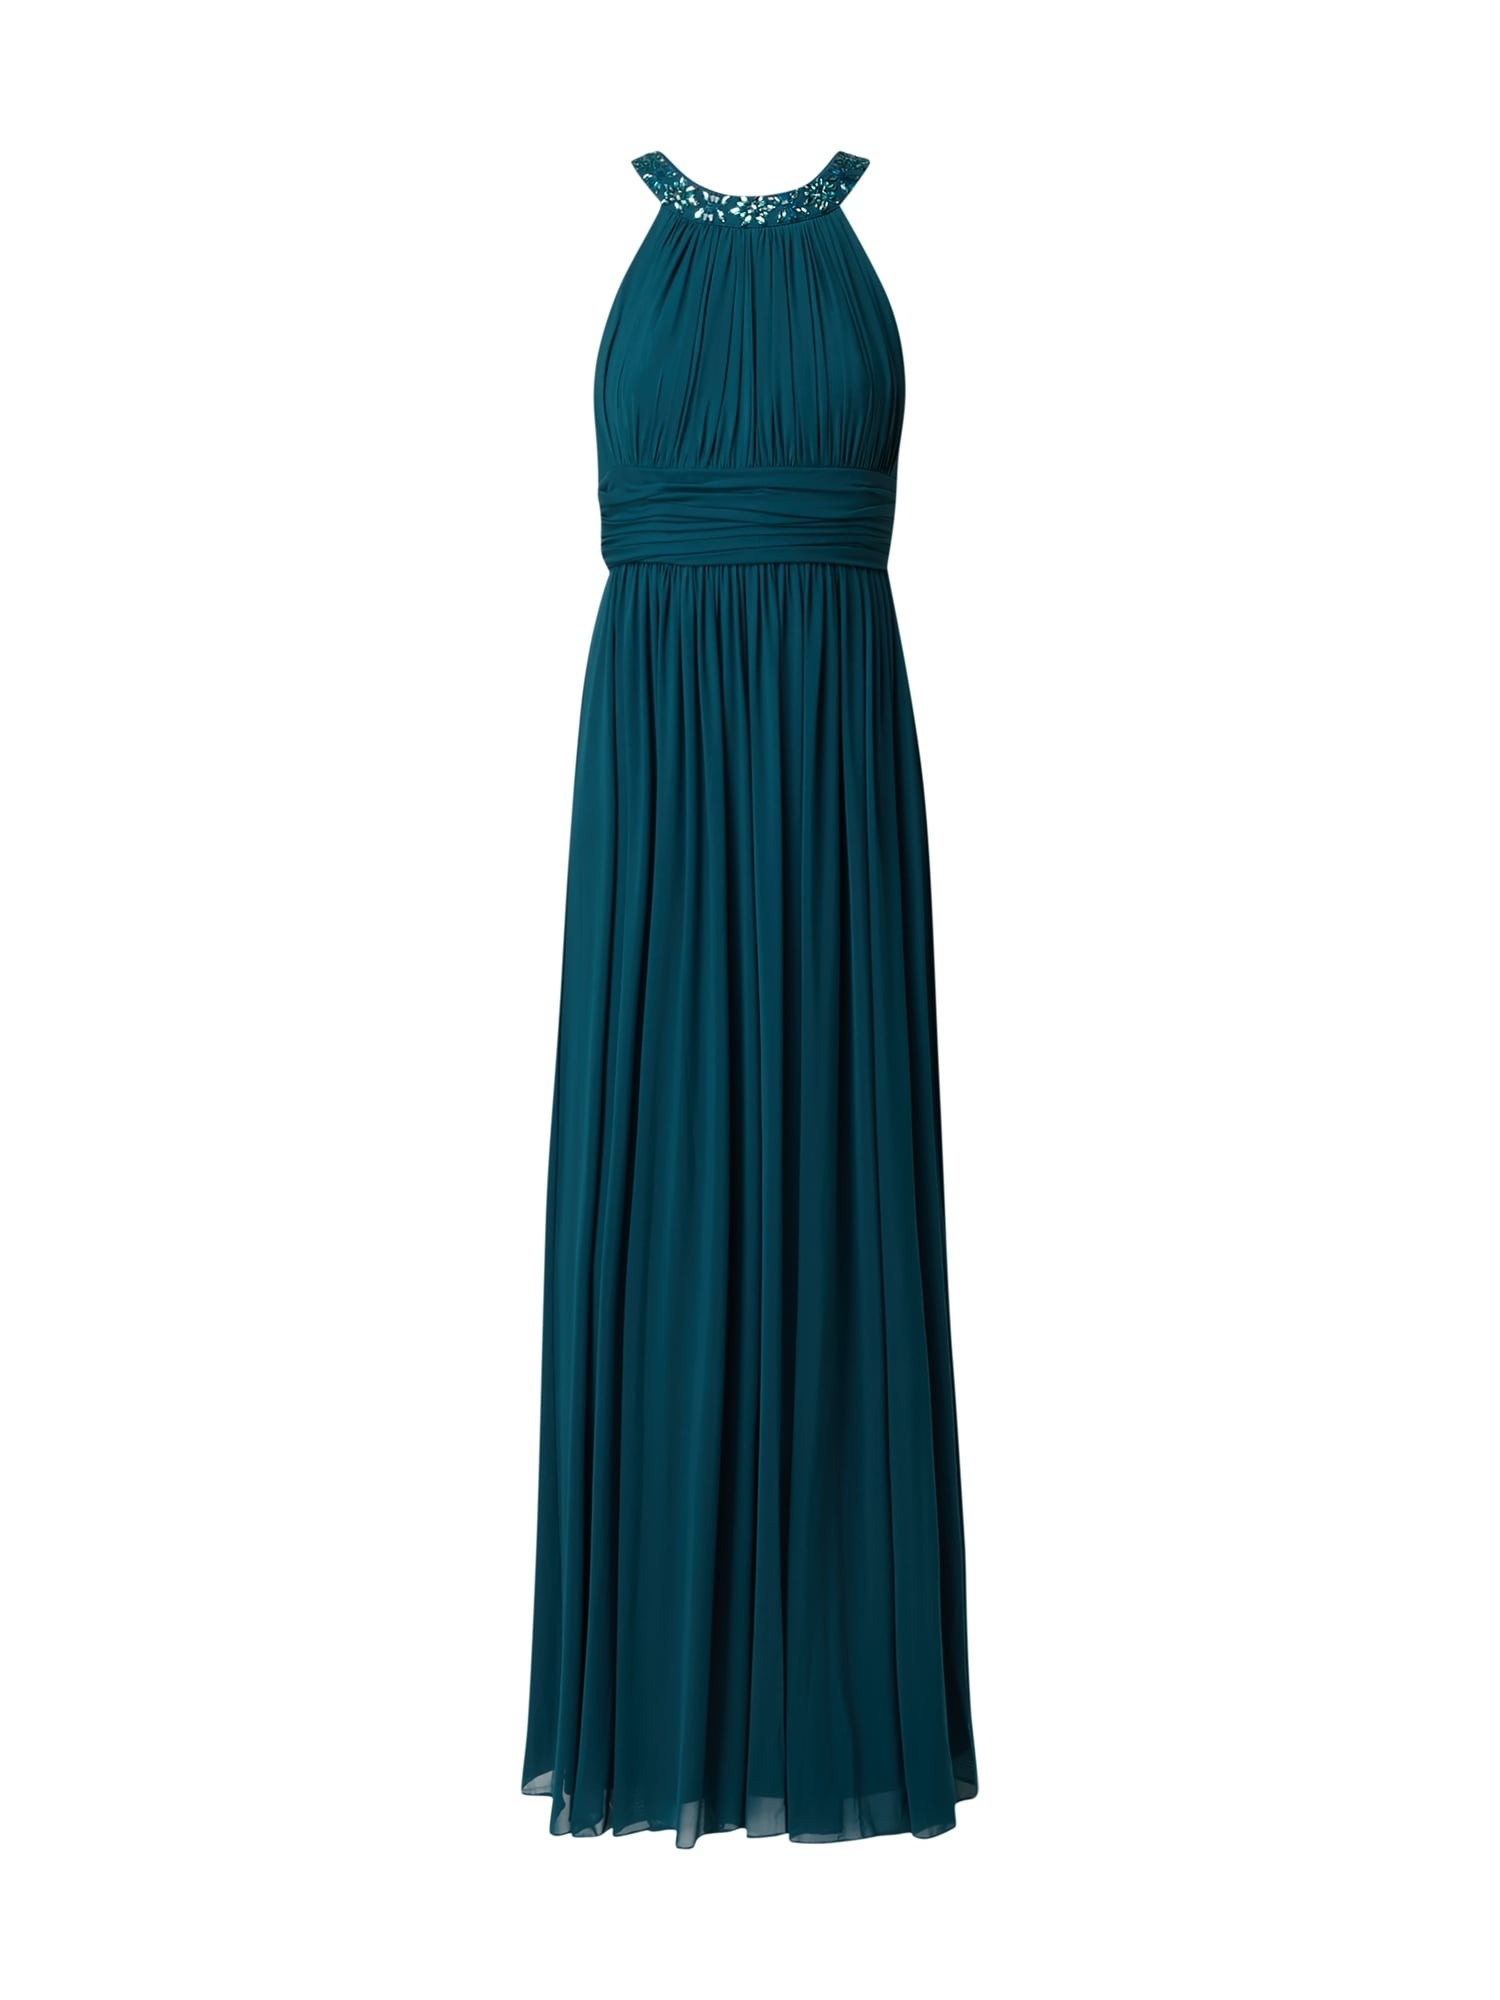 Designer Fantastisch Abendkleid Petrol Design15 Coolste Abendkleid Petrol Vertrieb